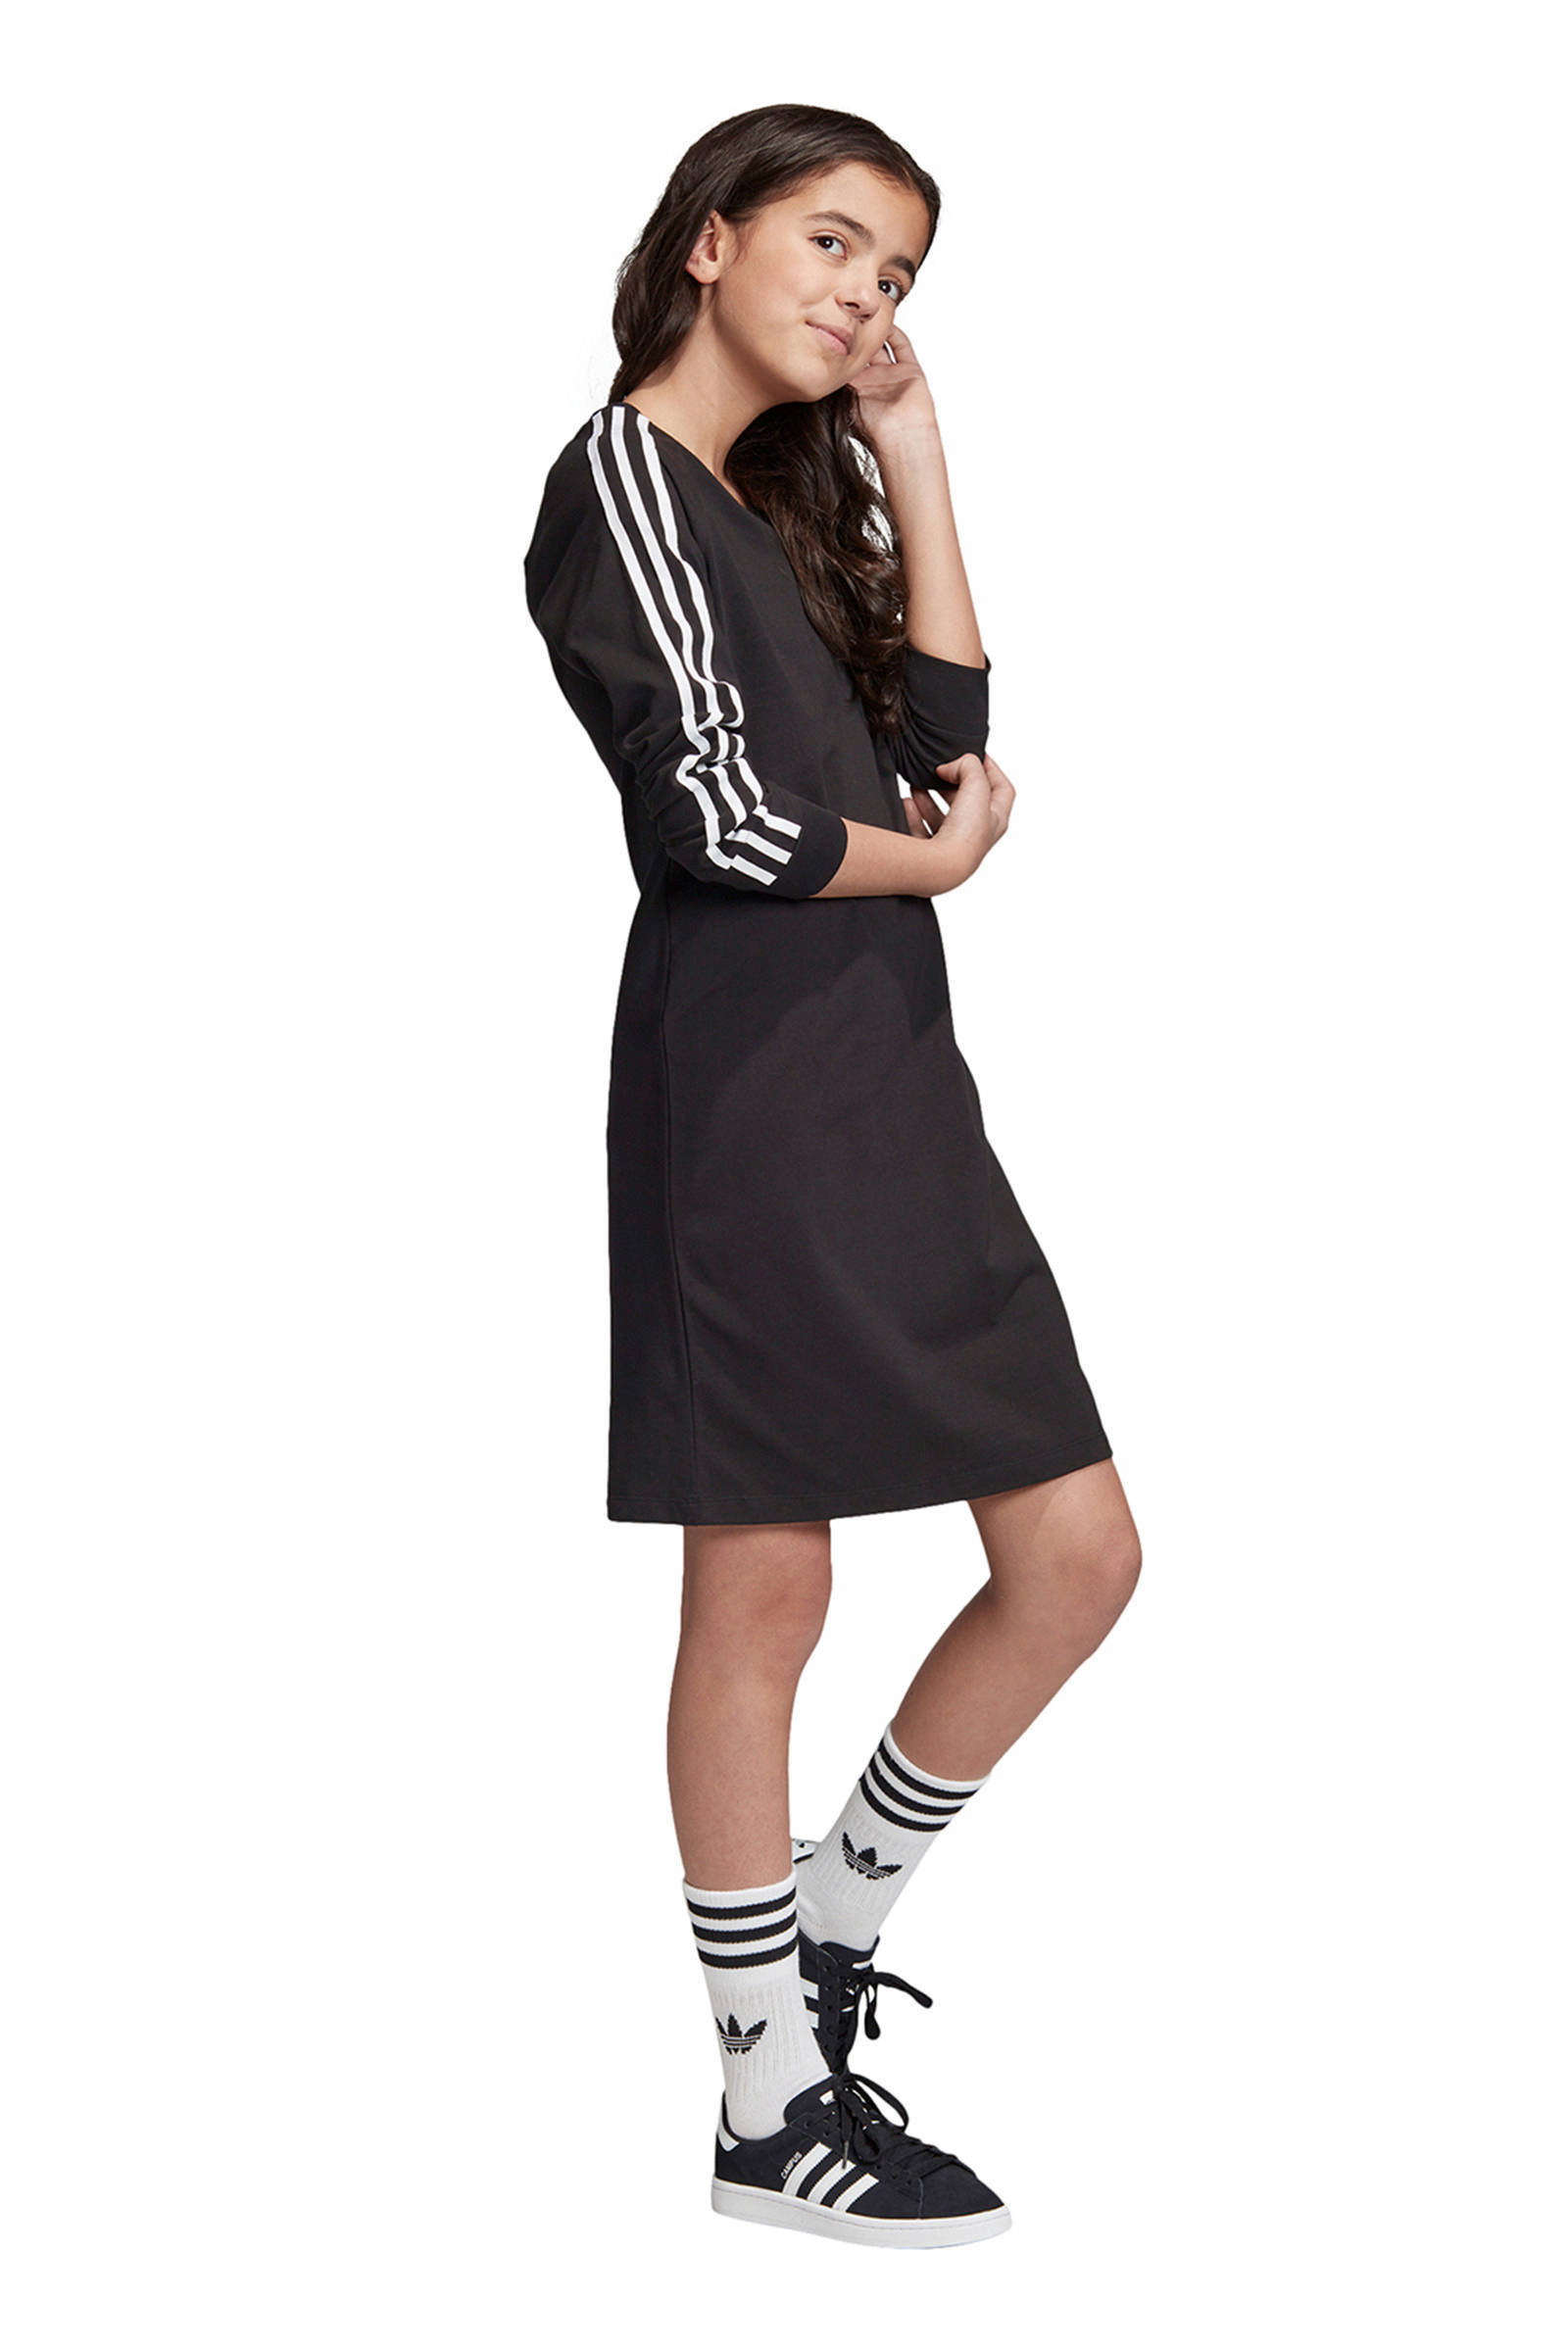 adidas Originals sweatjurk zwart   wehkamp